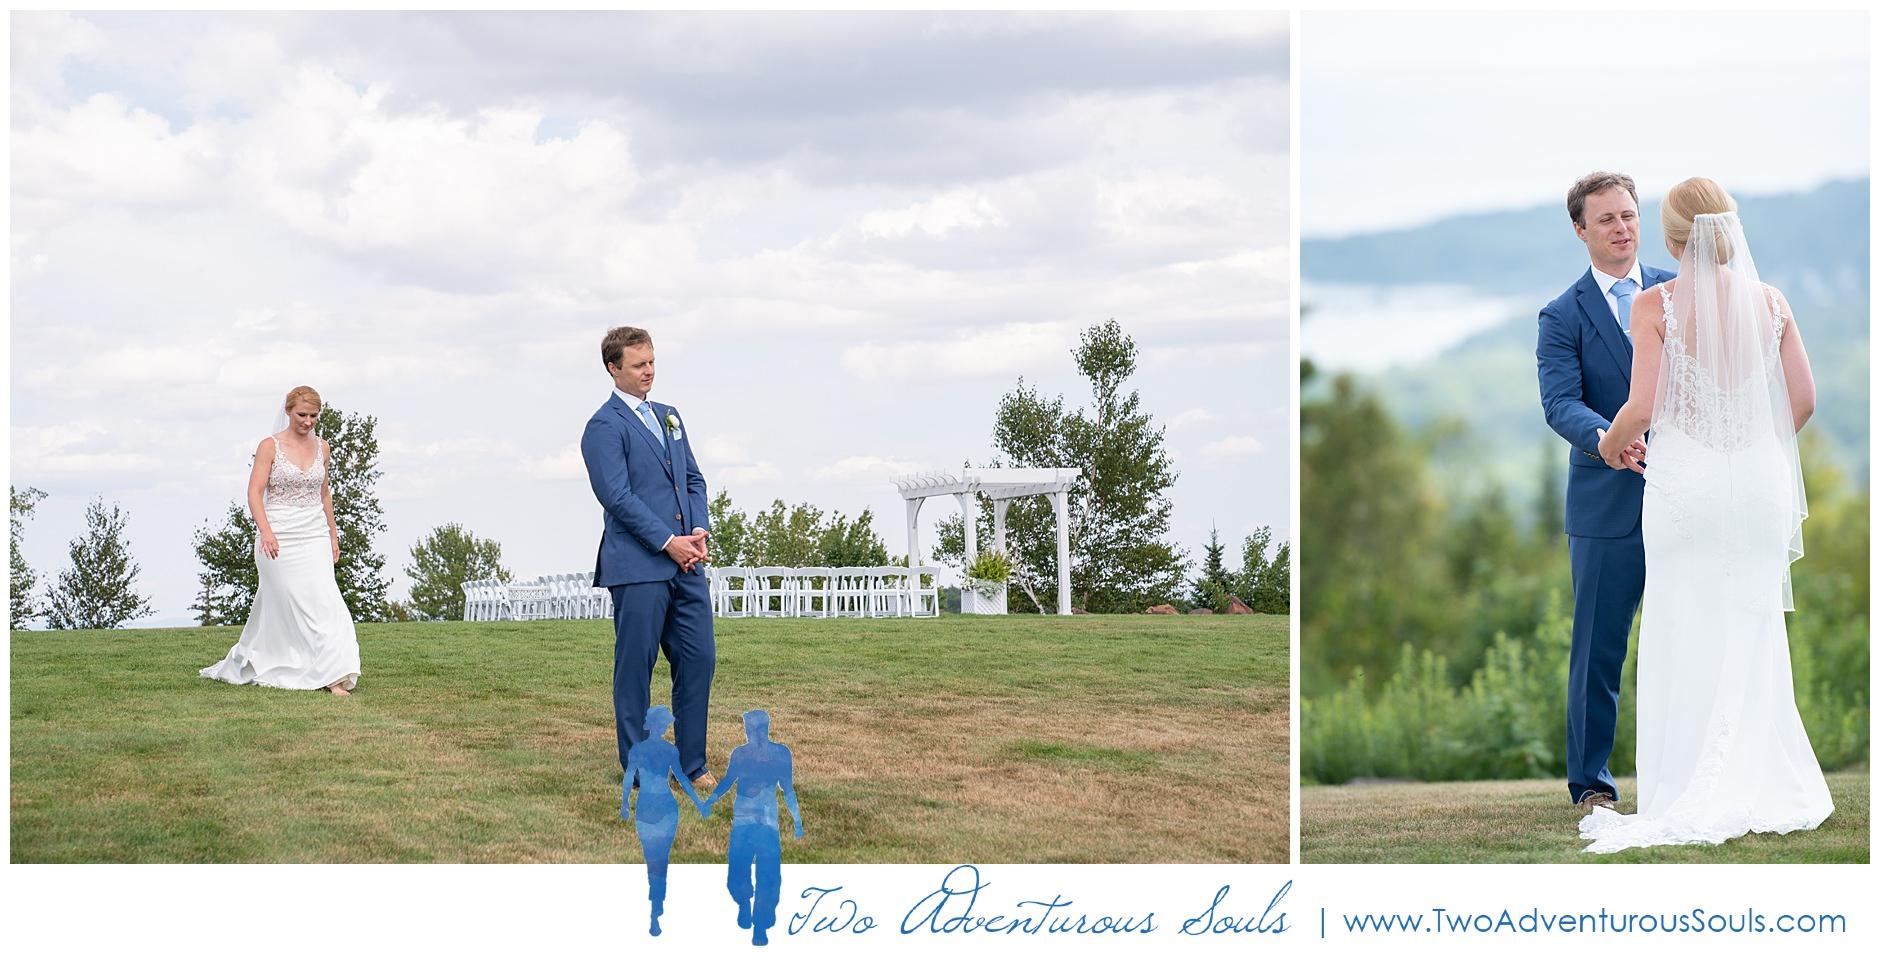 Maine Wedding Photographers, Point Lookout Wedding Photographers, Maine Elopement Photographers, Two Adventurous Souls-0080419_0022.jpg